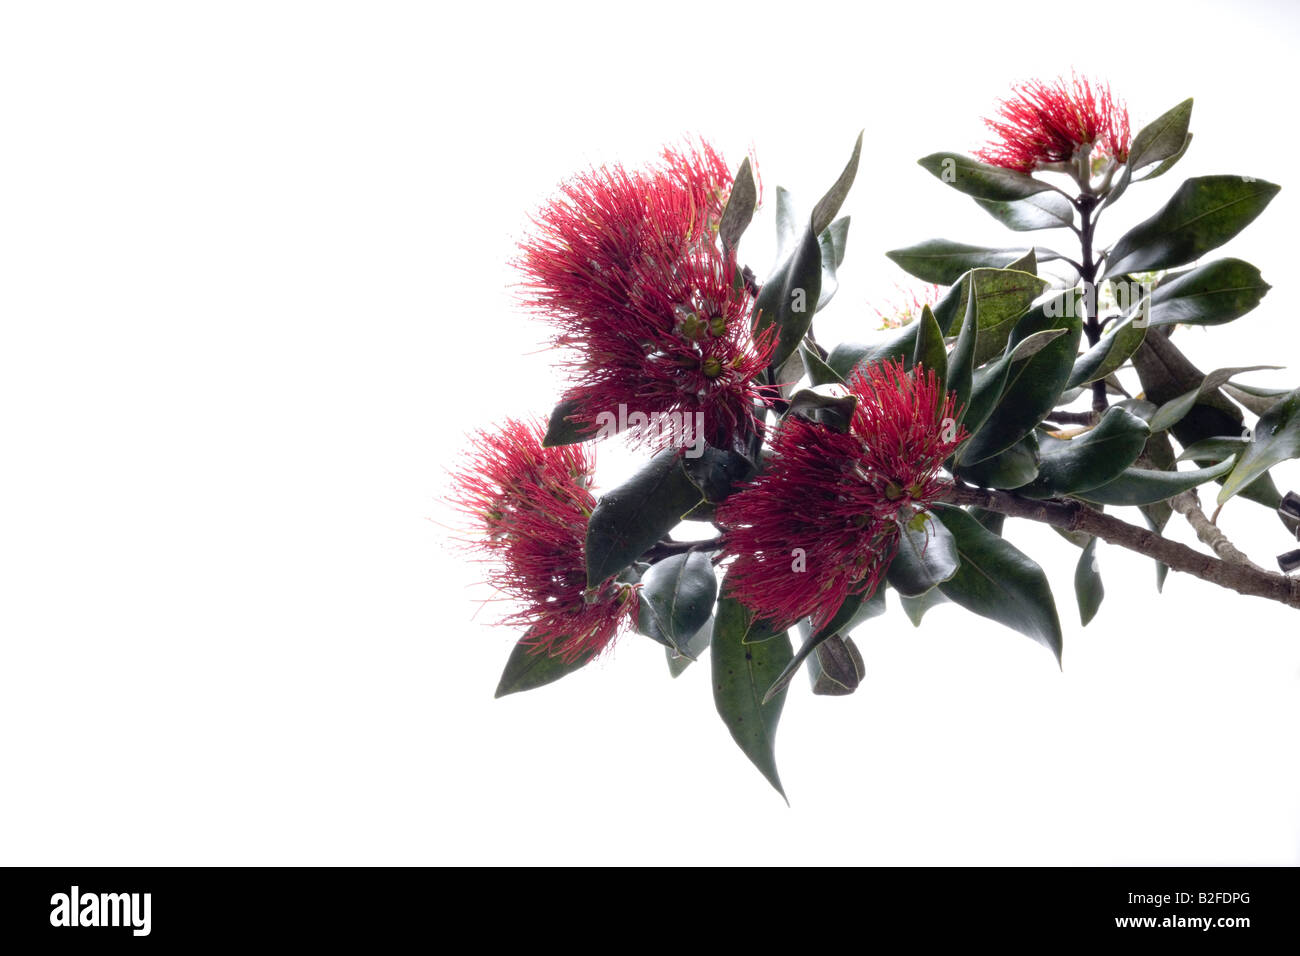 Pohutakawa blossom nz christmas xmas symbol nz new zealand stock pohutakawa blossom nz christmas xmas symbol nz new zealand biocorpaavc